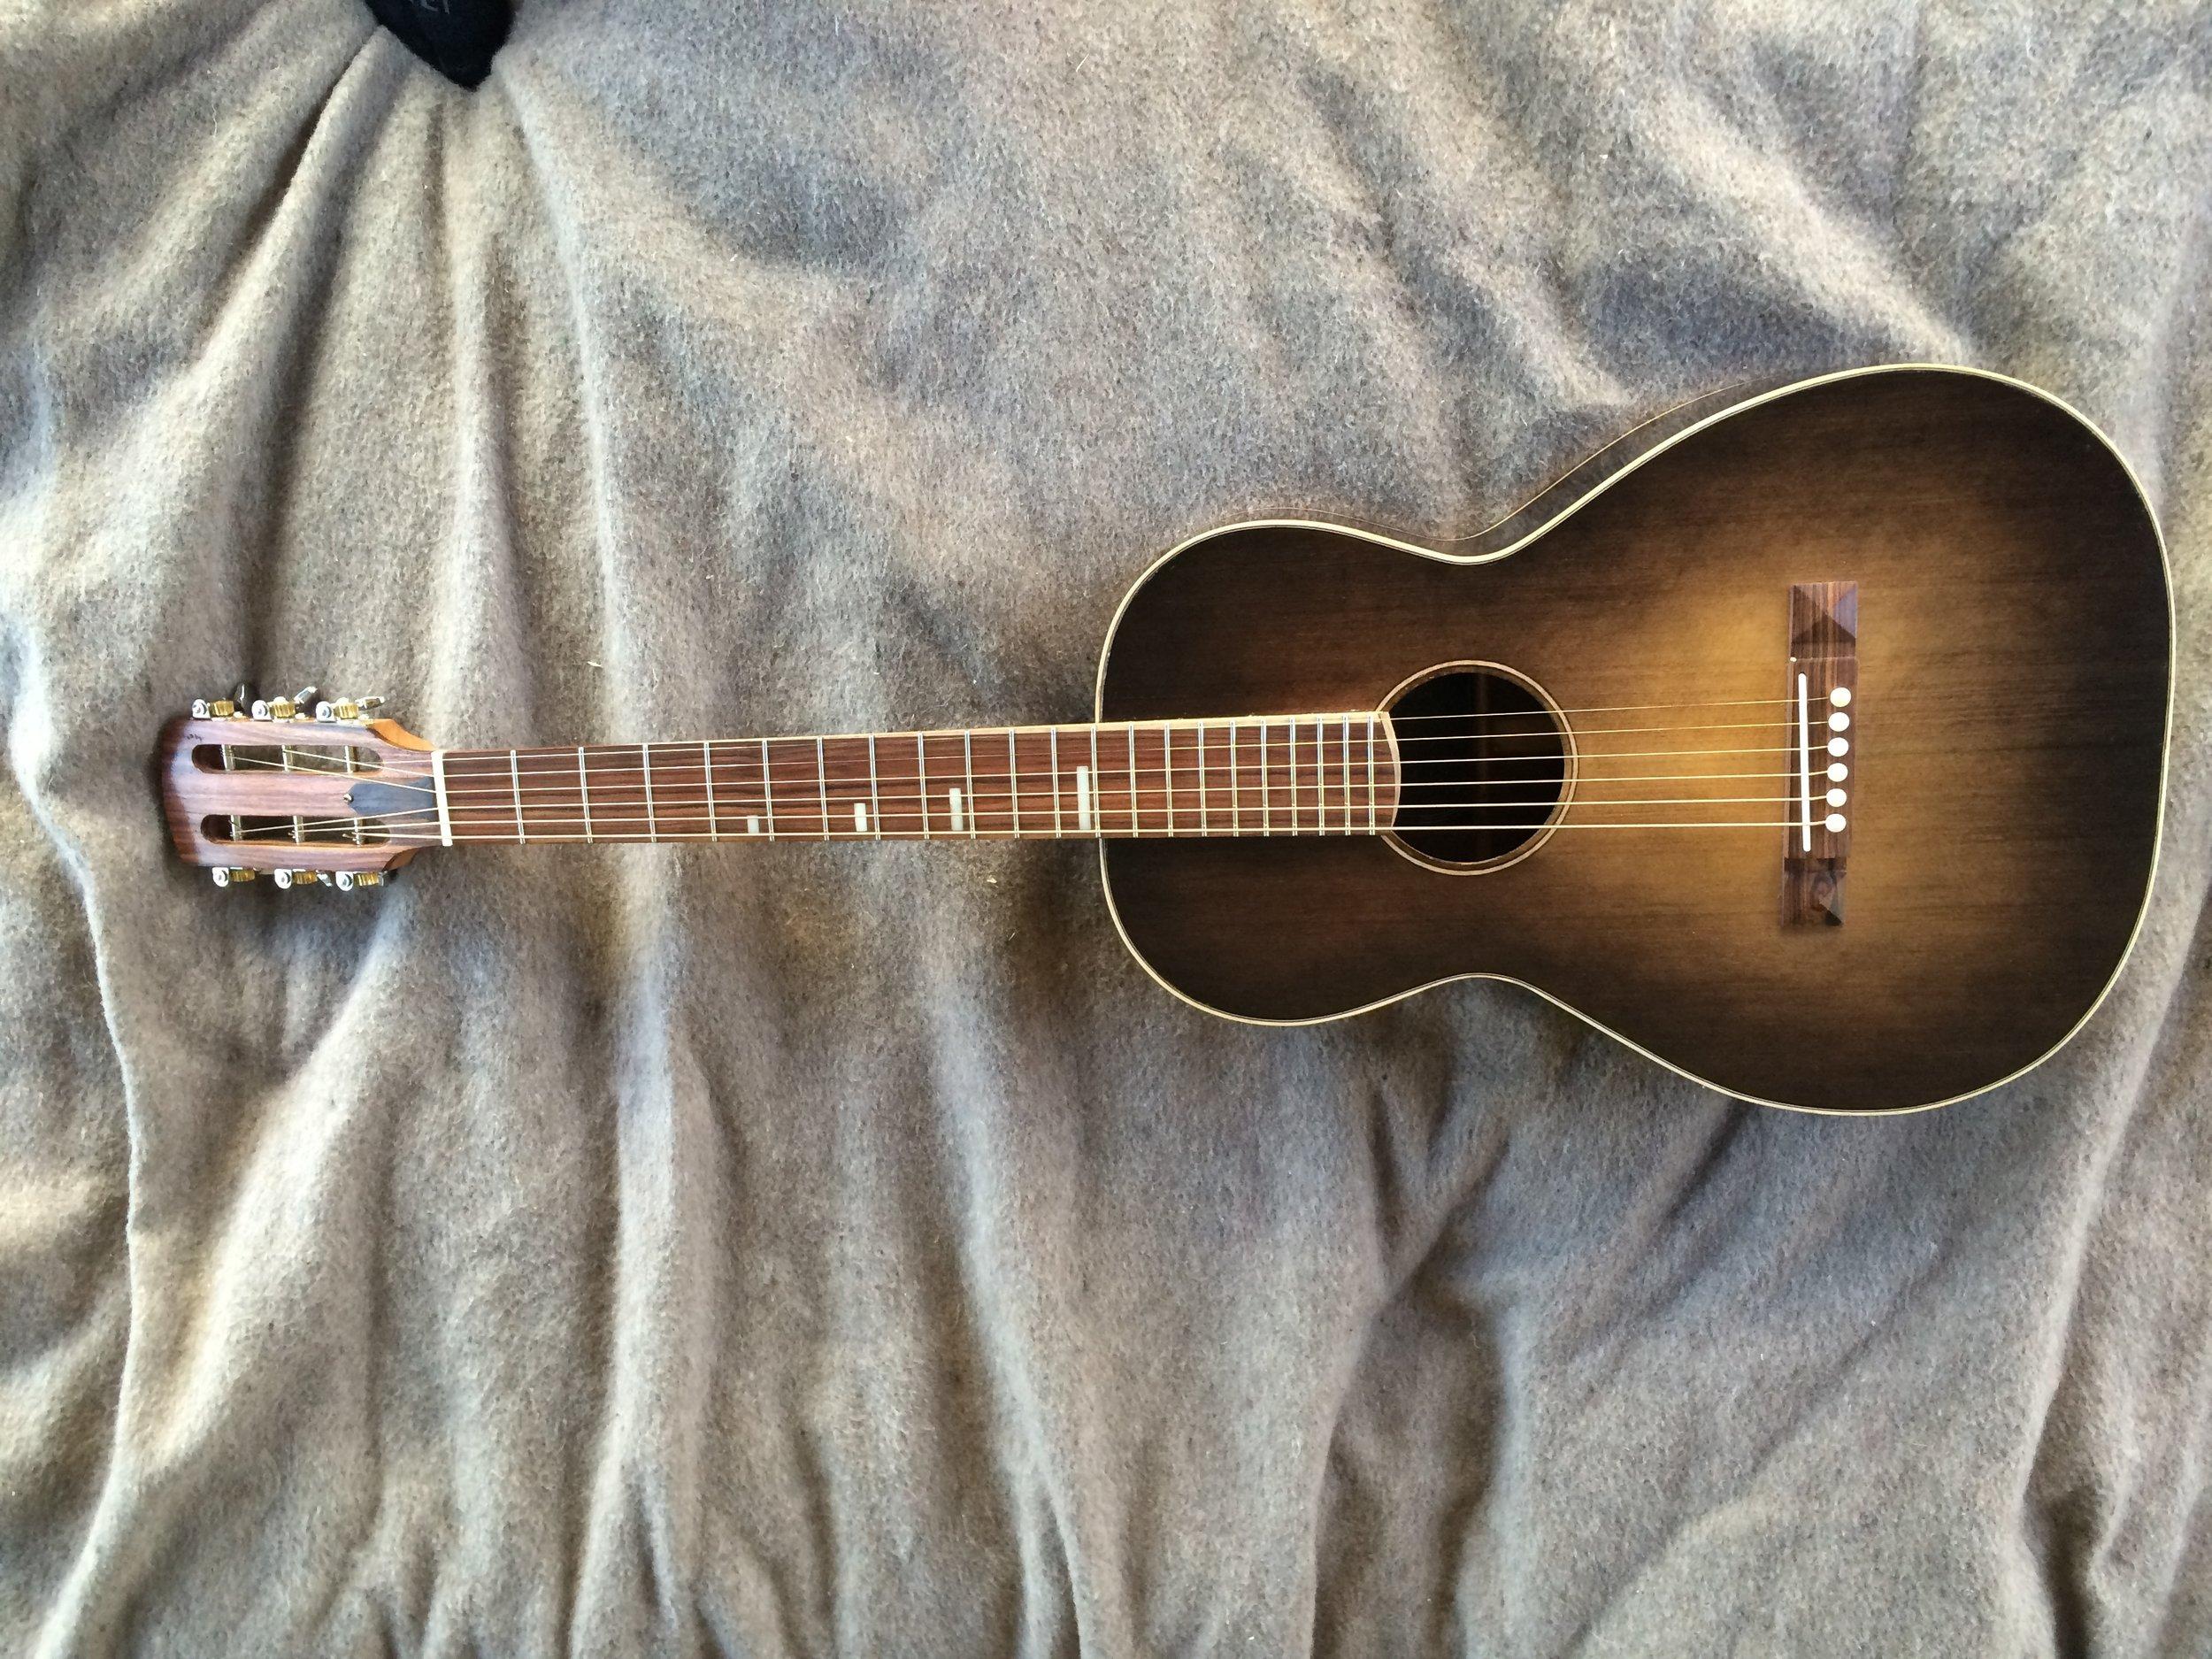 sunburst walnut acoustic guitar.jpg